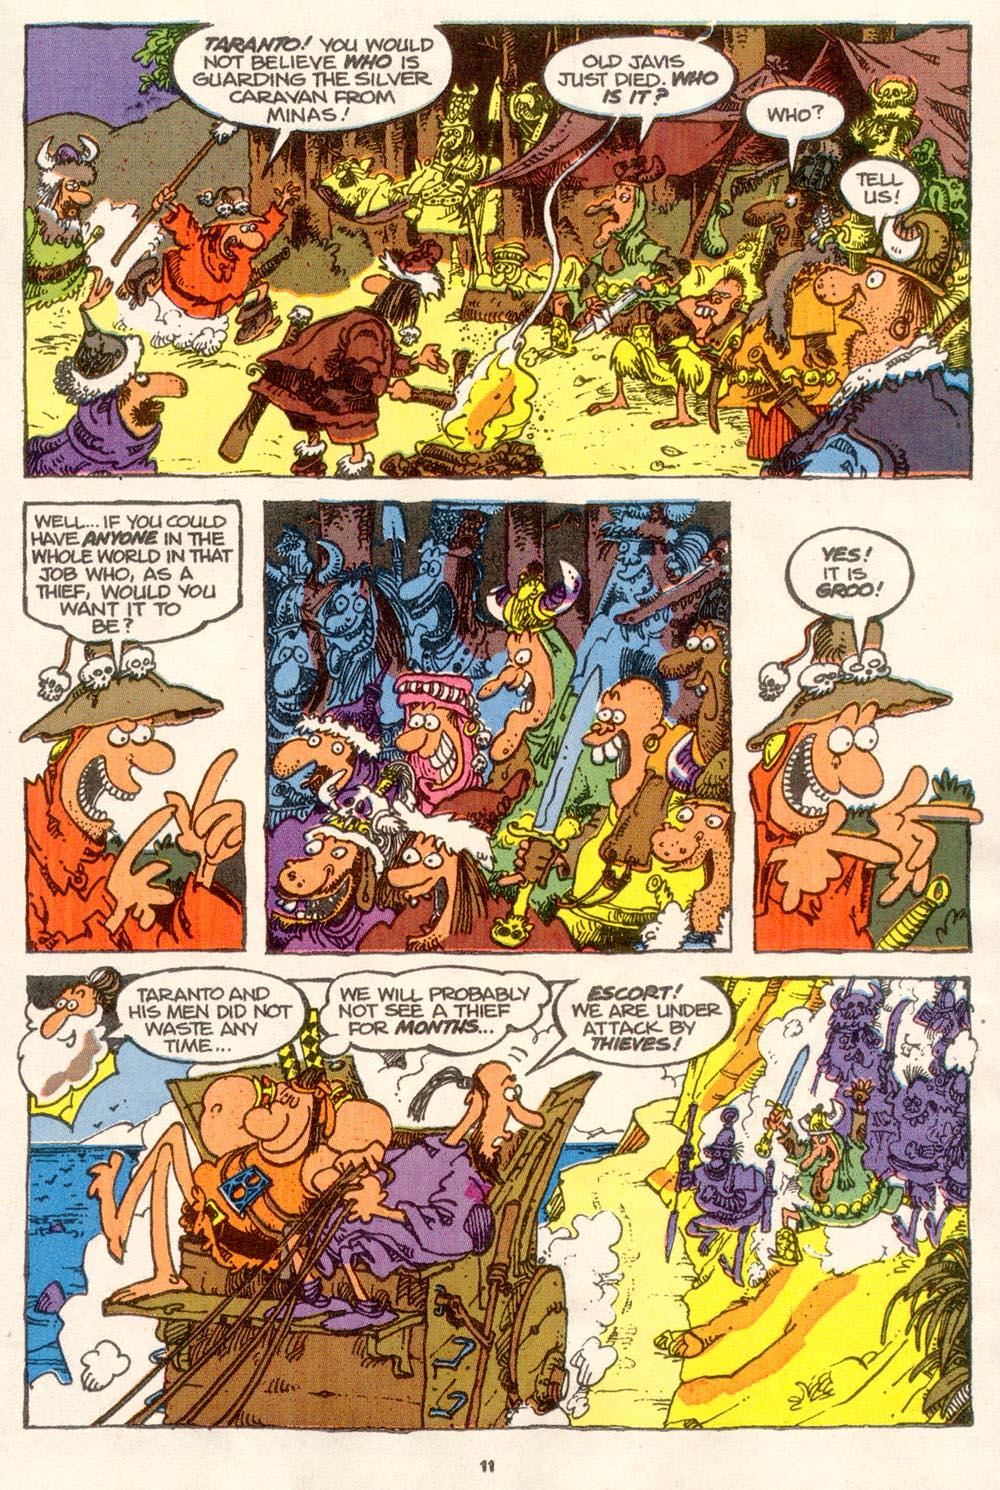 Read online Sergio Aragonés Groo the Wanderer comic -  Issue #76 - 8